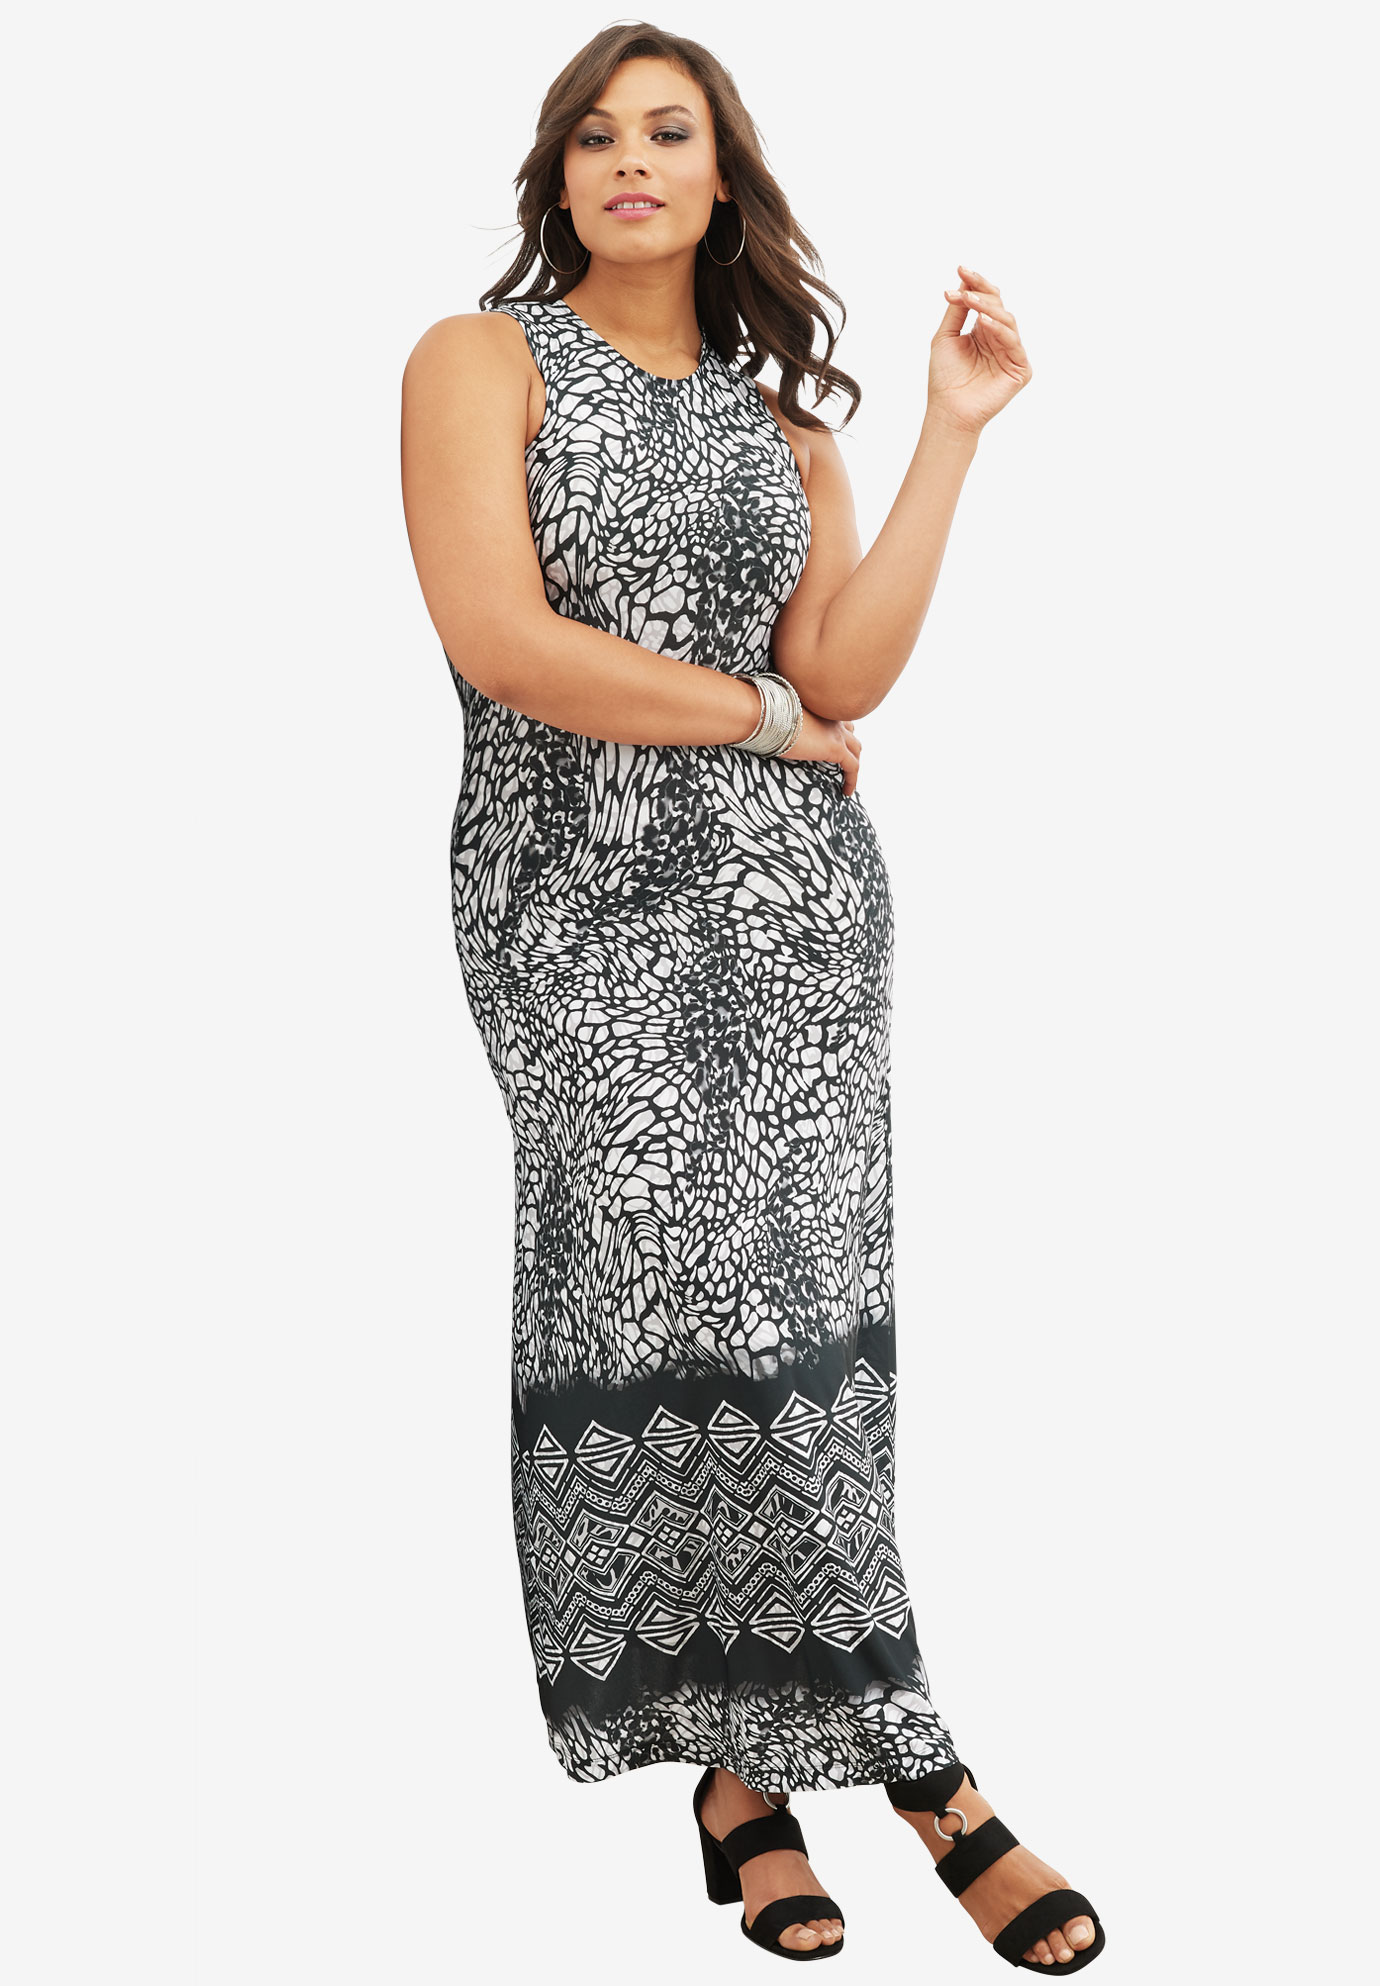 Plus Size Dresses for Women